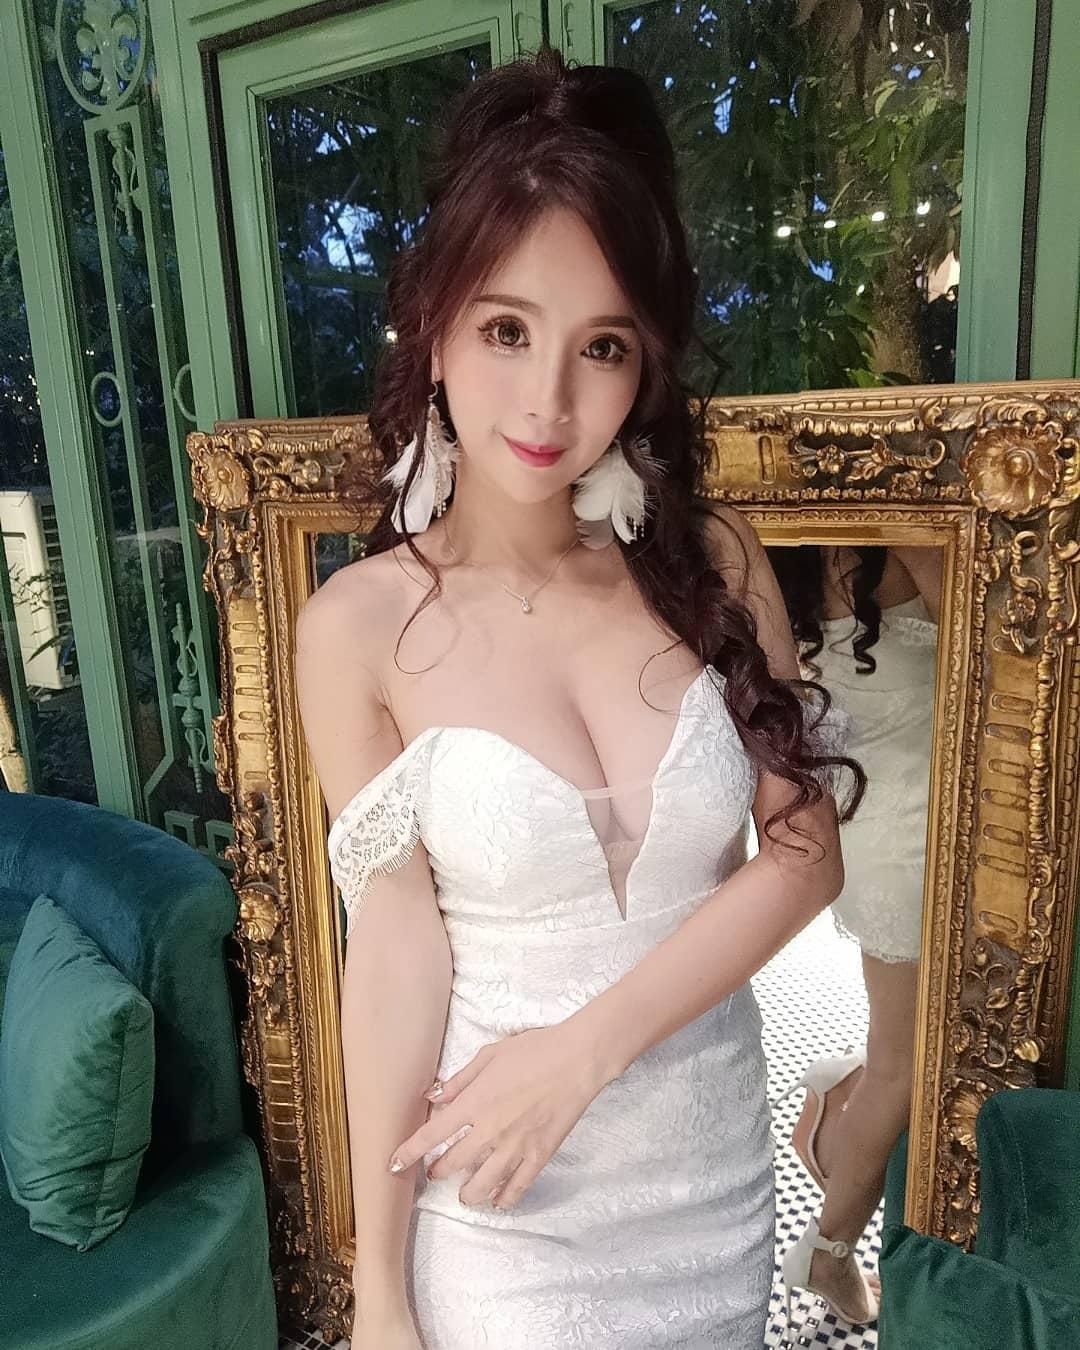 uCxRH1 - IG正妹—甄馨Tiffany